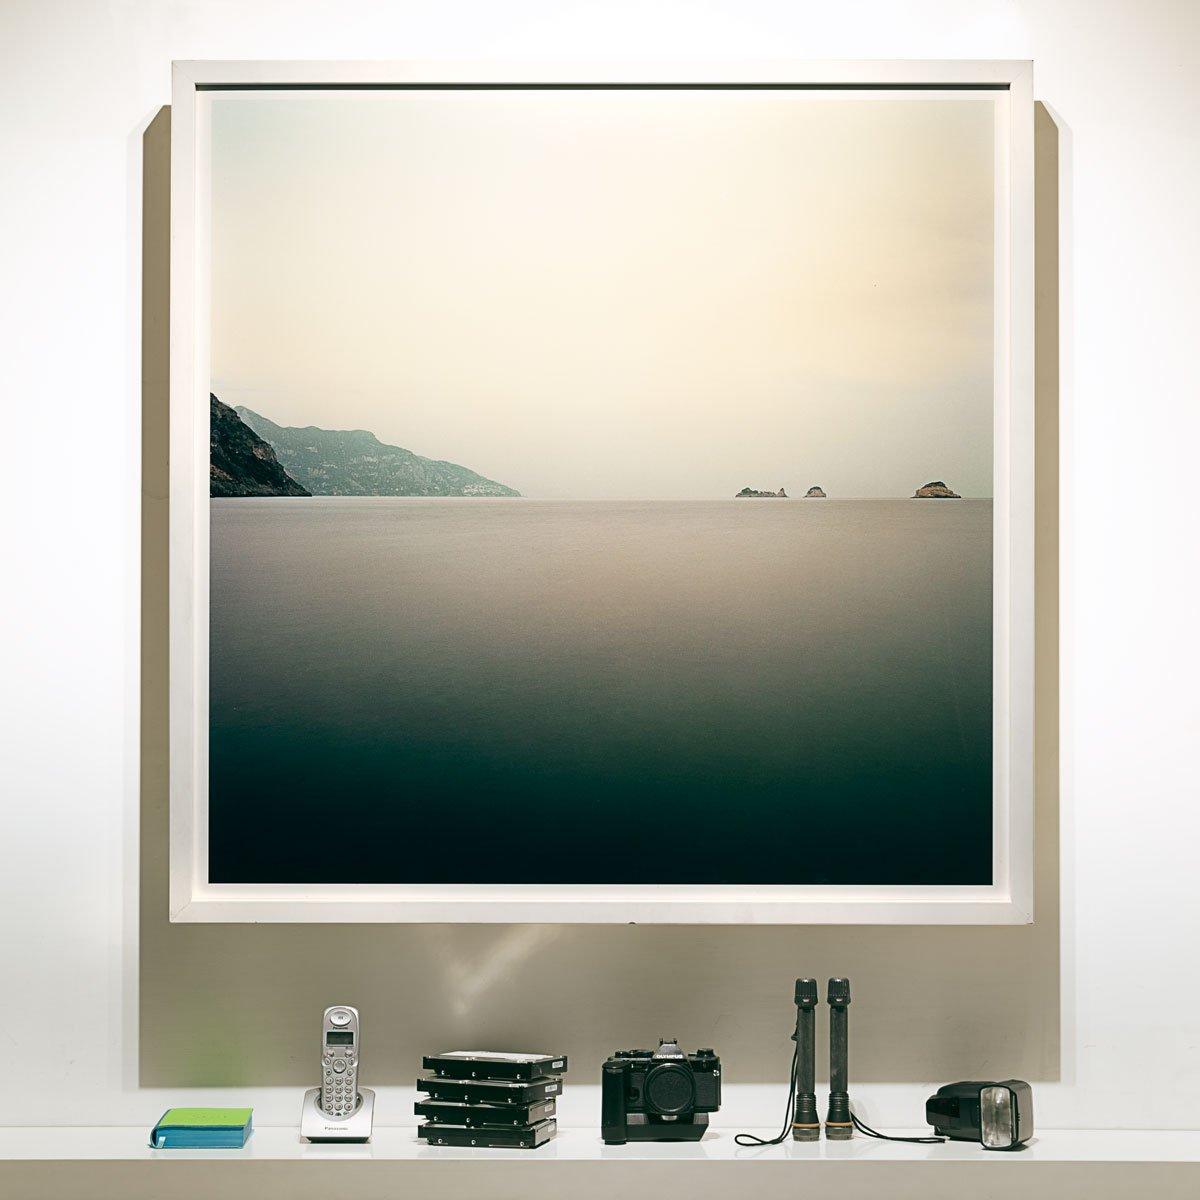 Costiera Amalfitana Isolotti Vetara E Li-Galli / Formato 100 x 100 cm / Luca Tamagnini Catalogo 2017-002